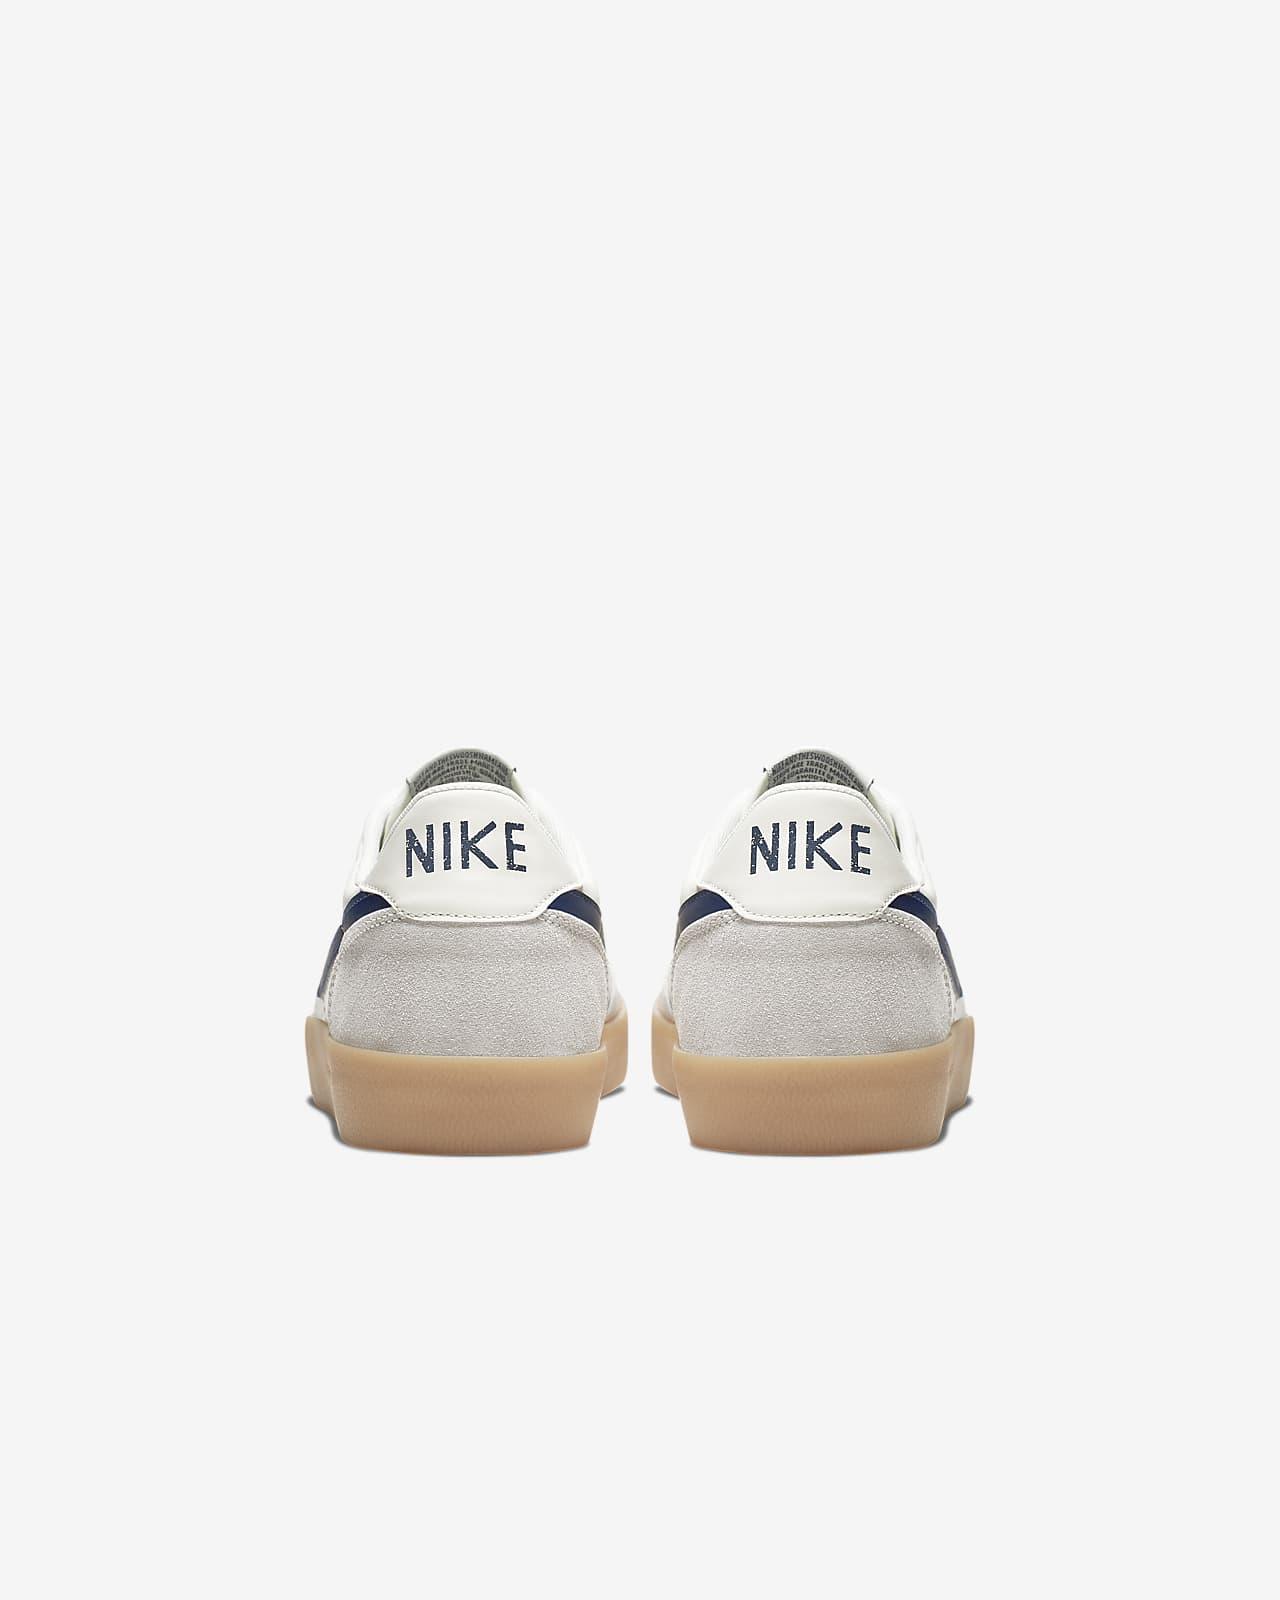 nike killshot 2 price